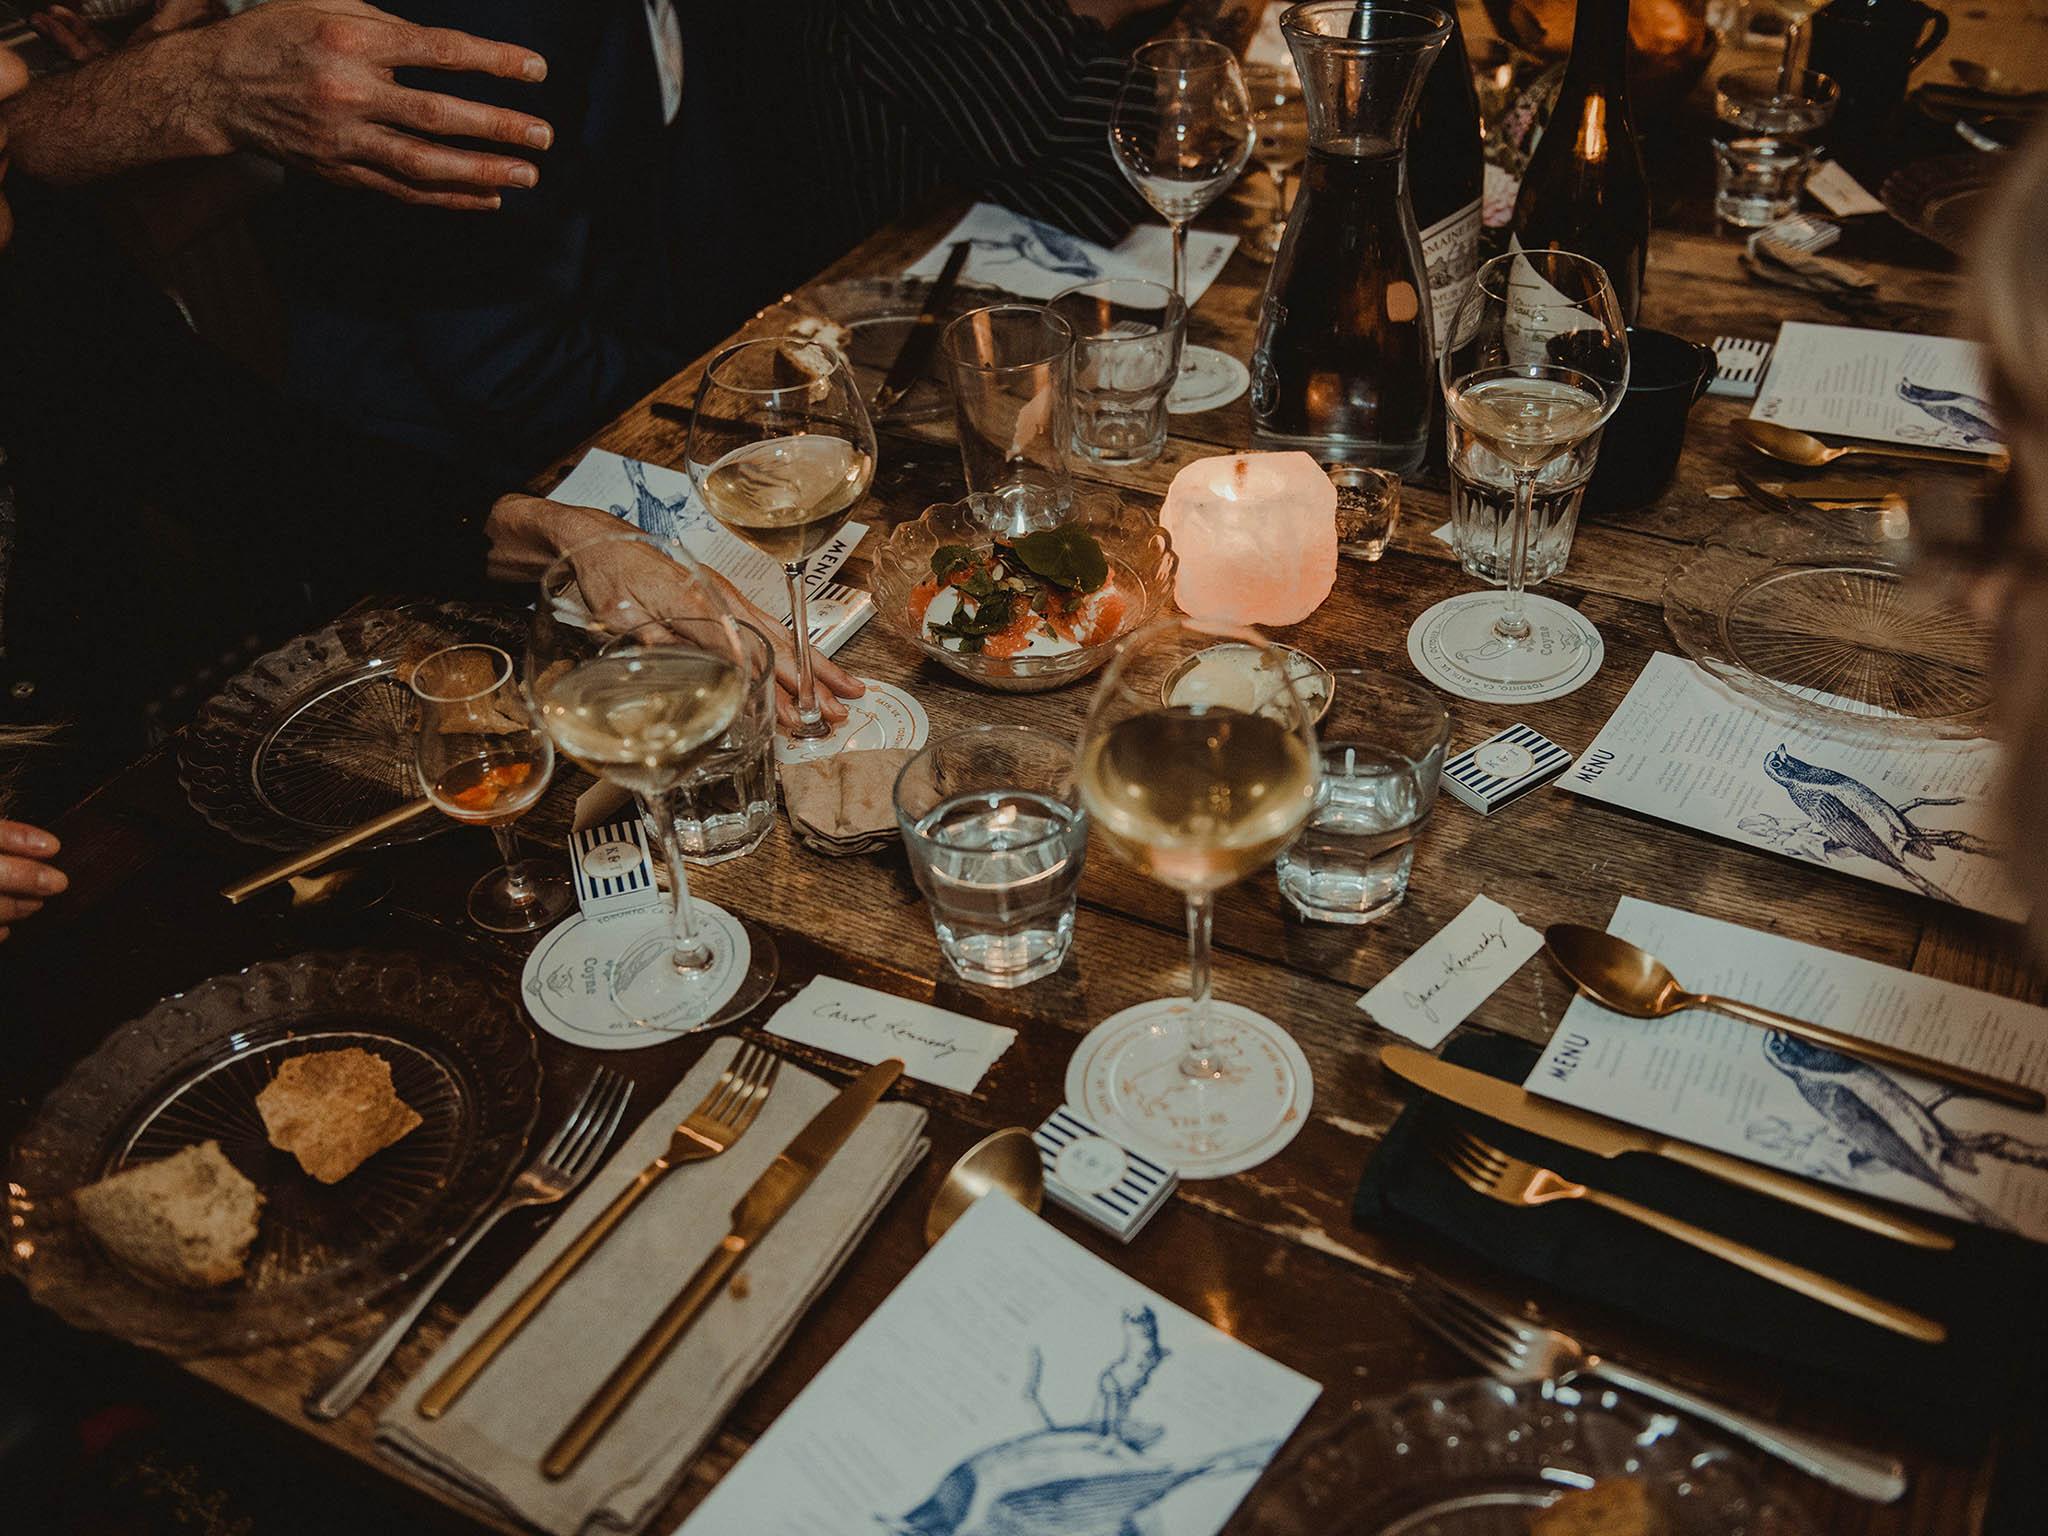 Castle Farm Cafe, restaurant review: An unimprovable lunch down on the farm 1